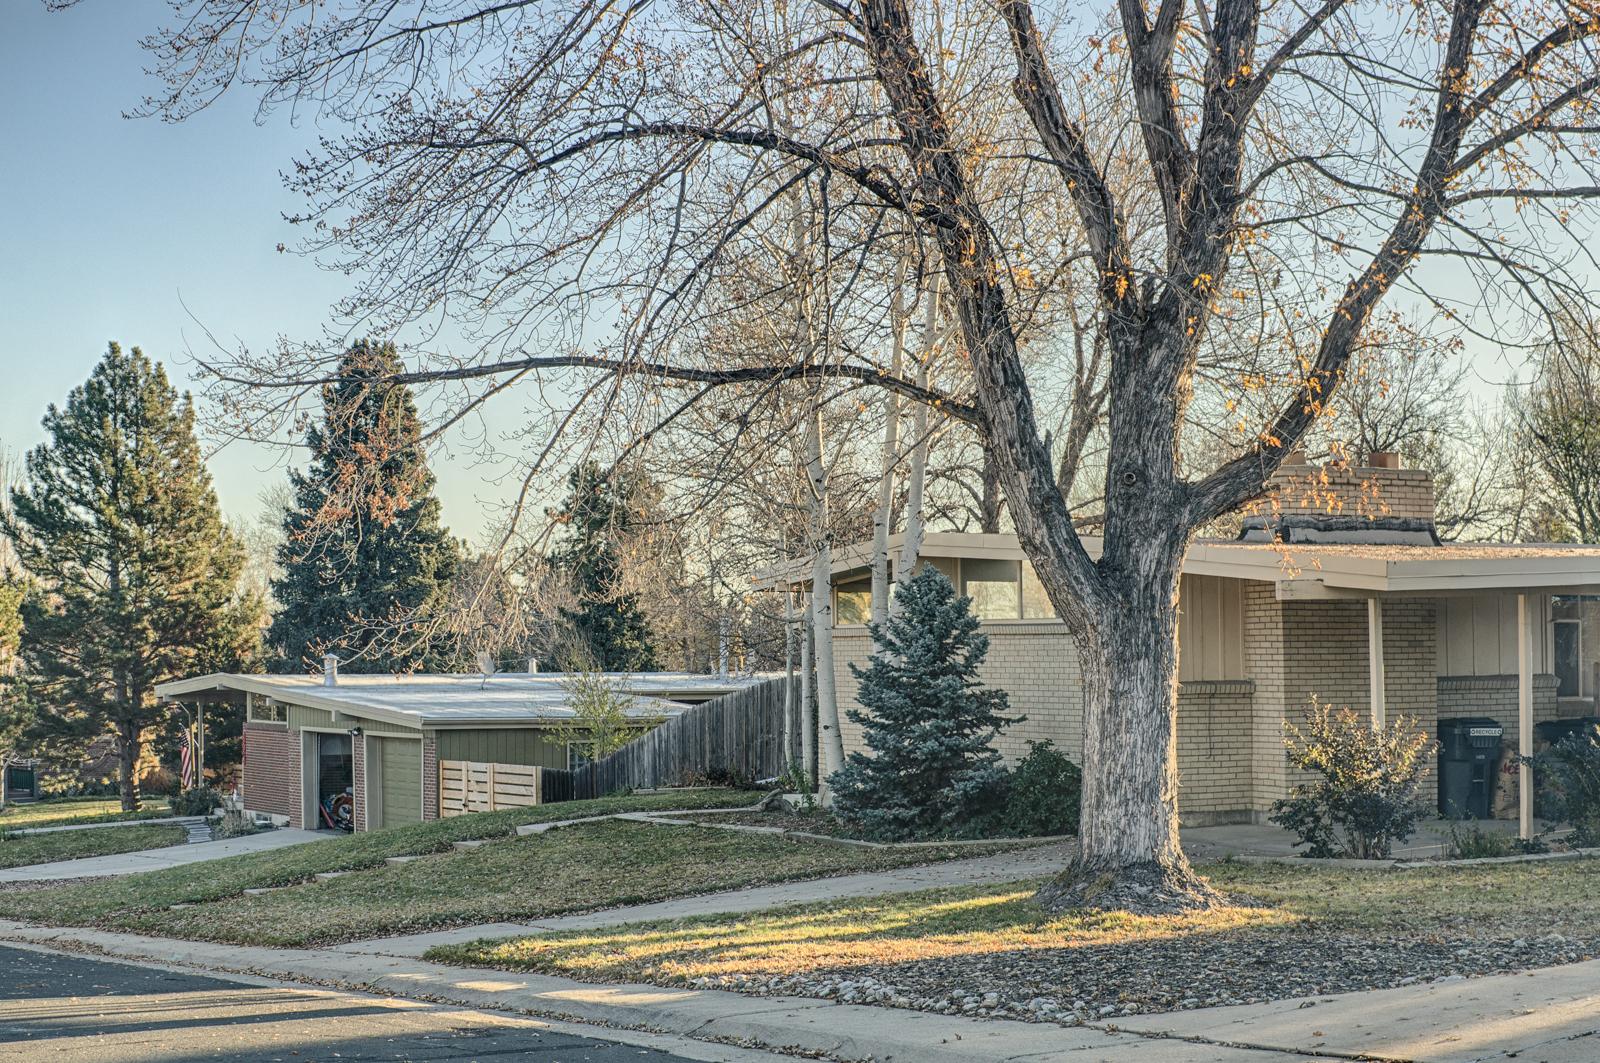 Adrian-Kinney-Dream-House-Acres-4.jpg